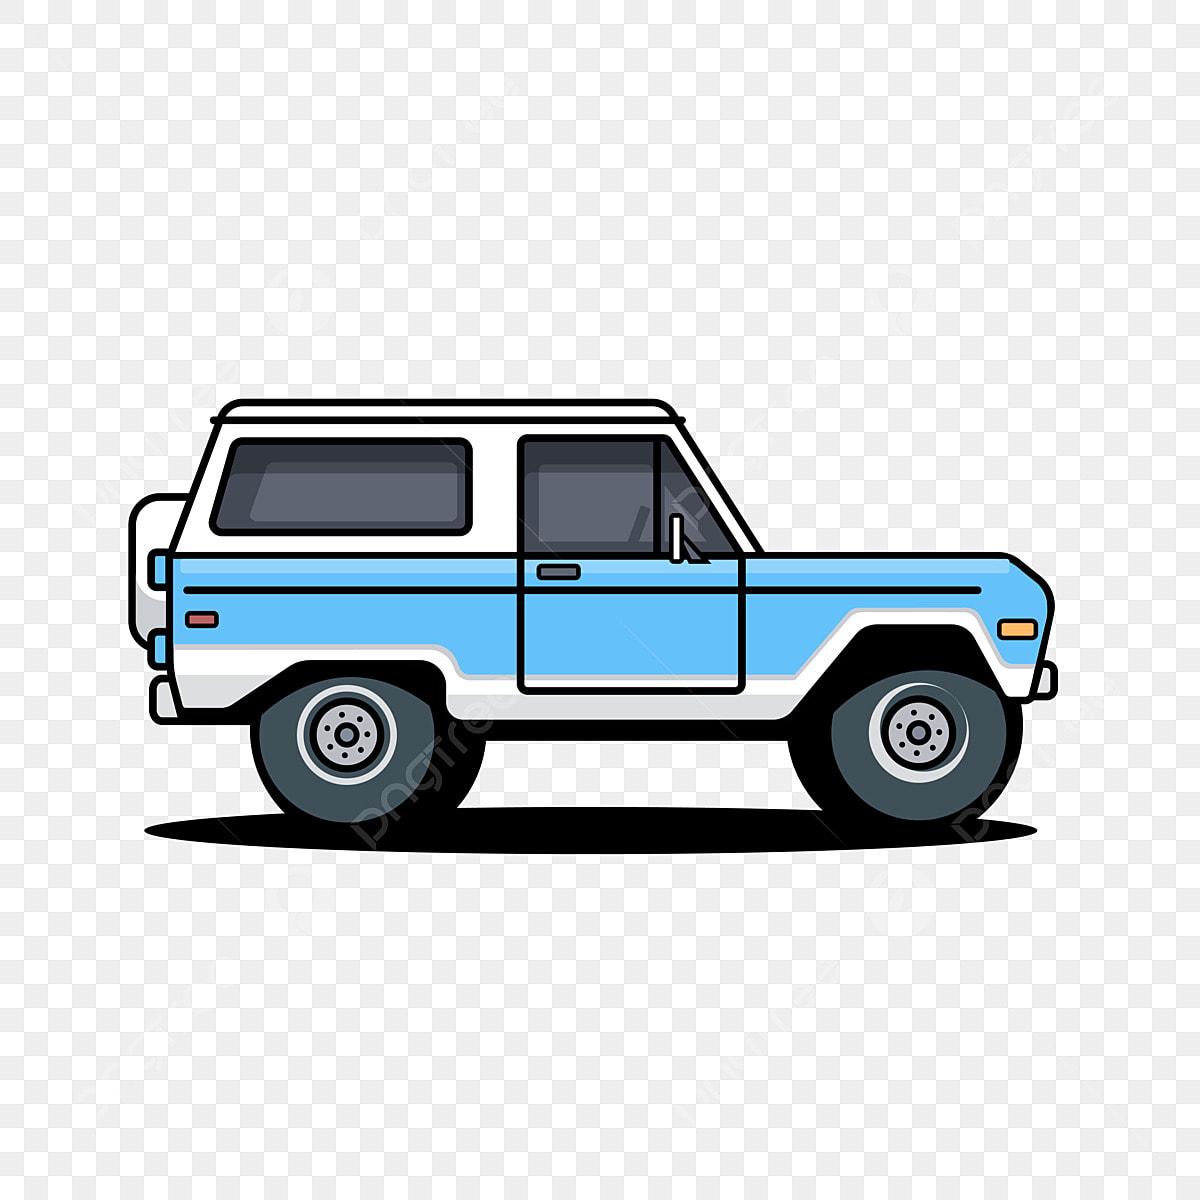 Gambar Kartun Jip Mobil Vektor Mg Datar Ai Jeep Clipart Kartun Mg Png Dan Vektor Dengan Latar Belakang Transparan Untuk Unduh Gratis